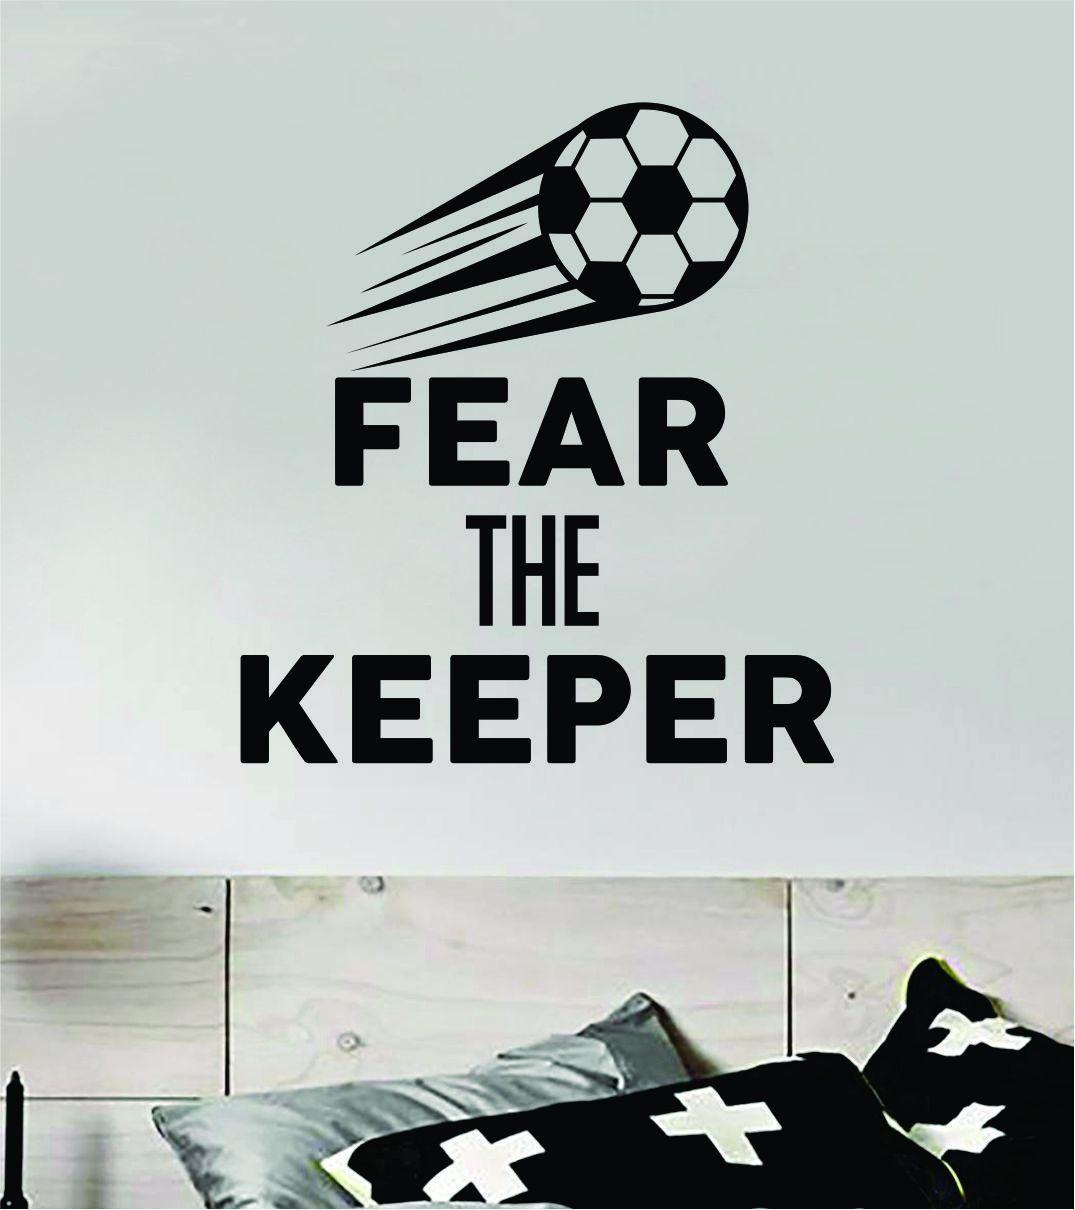 Fear the Keeper V3 Quote Wall Decal Sticker Bedroom Vinyl Art Home Decor Inspirational Kids Boys Nursery Sports Teen Soccer Futbol Ball Goalie FIFA - gold